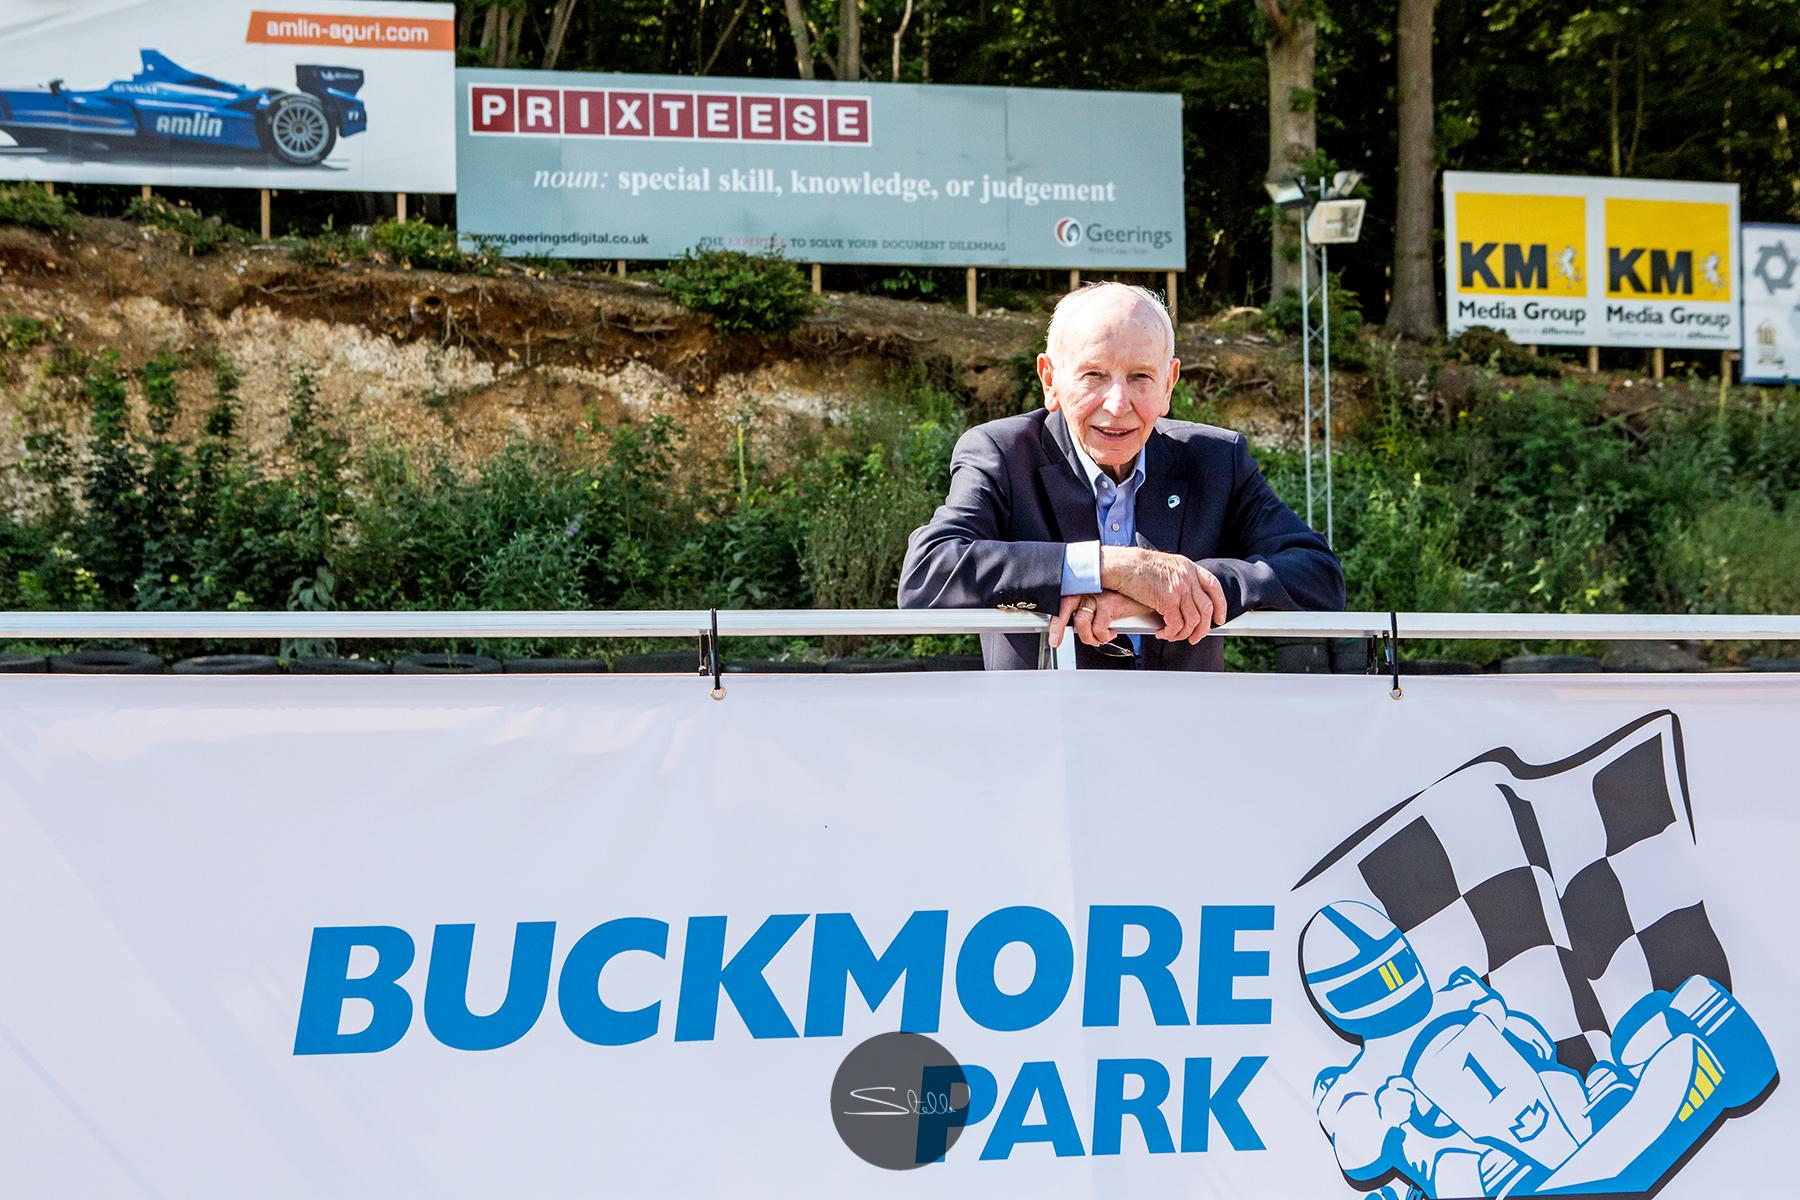 Stella Scordellis Buckmore Park 2015 7 Watermarked.jpg